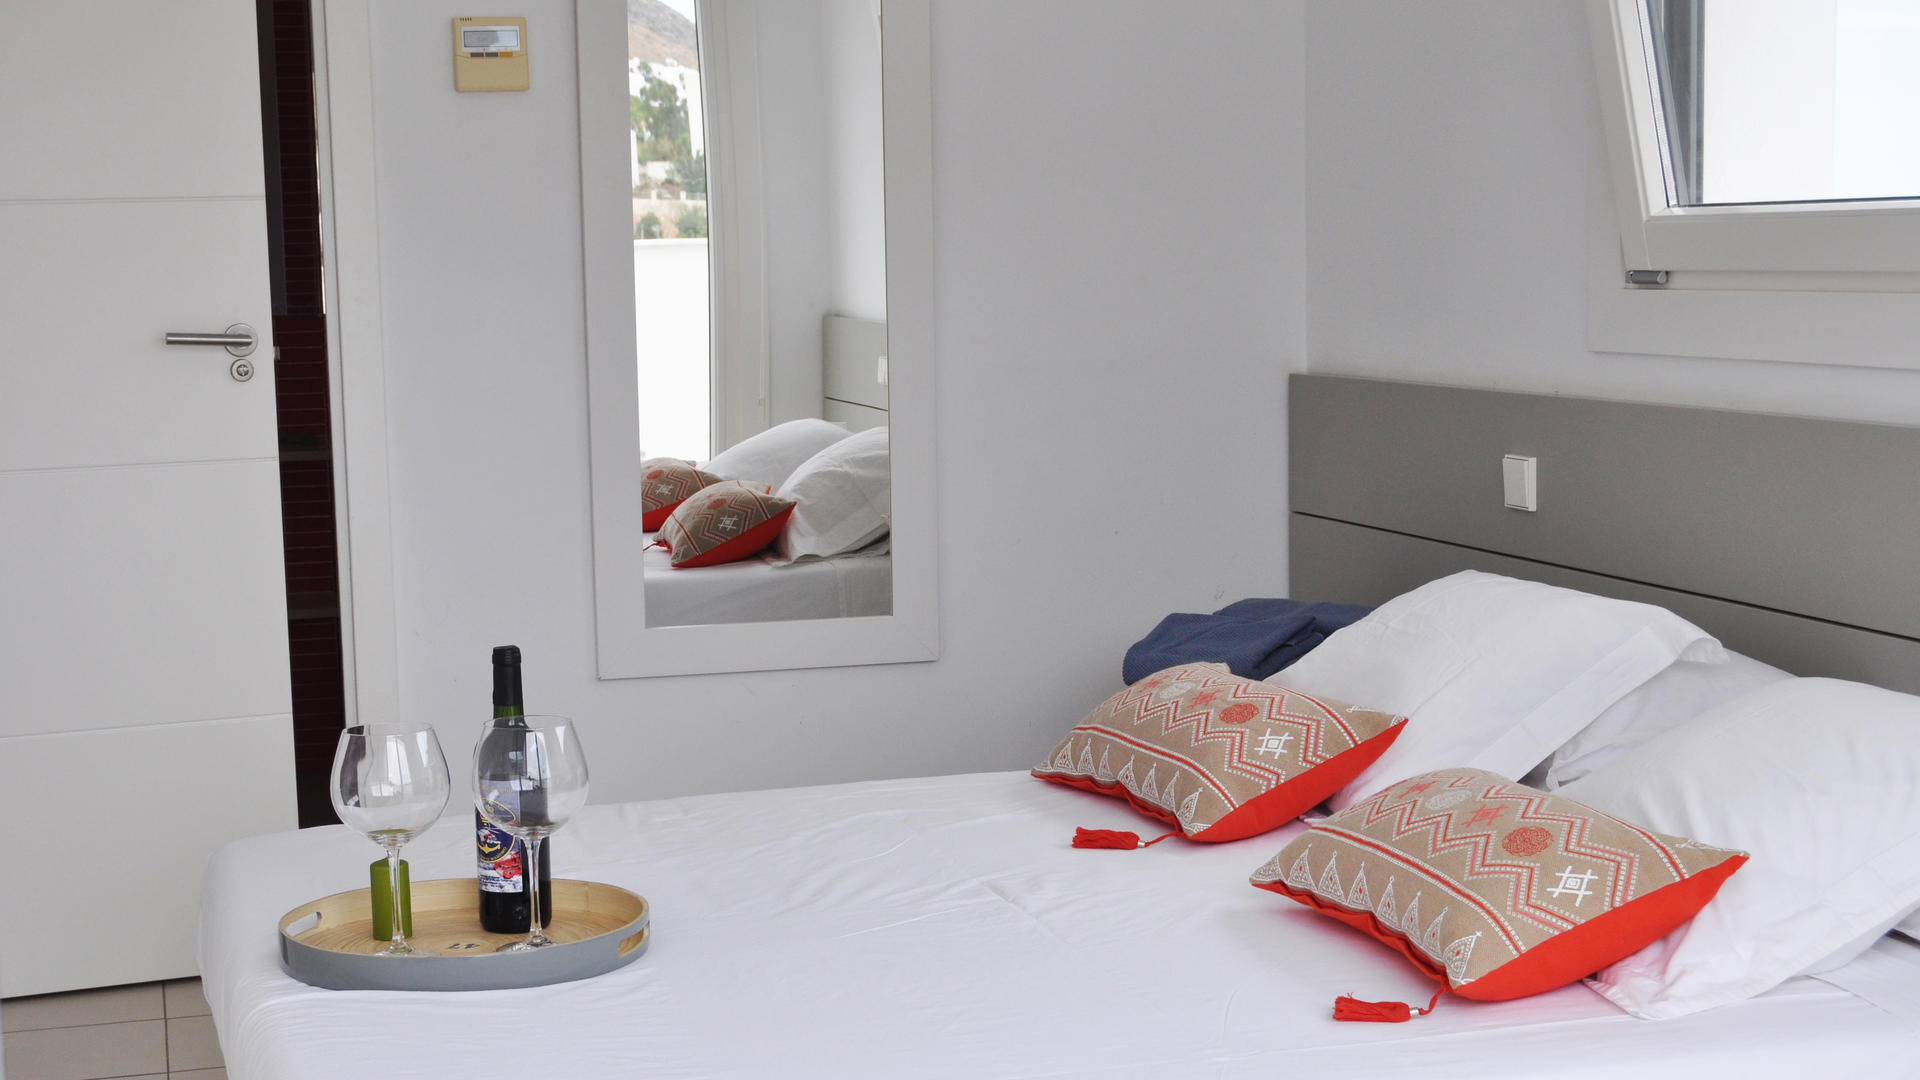 Apartamento -                                       Las Negras -                                       3 dormitorios -                                       7 ocupantes